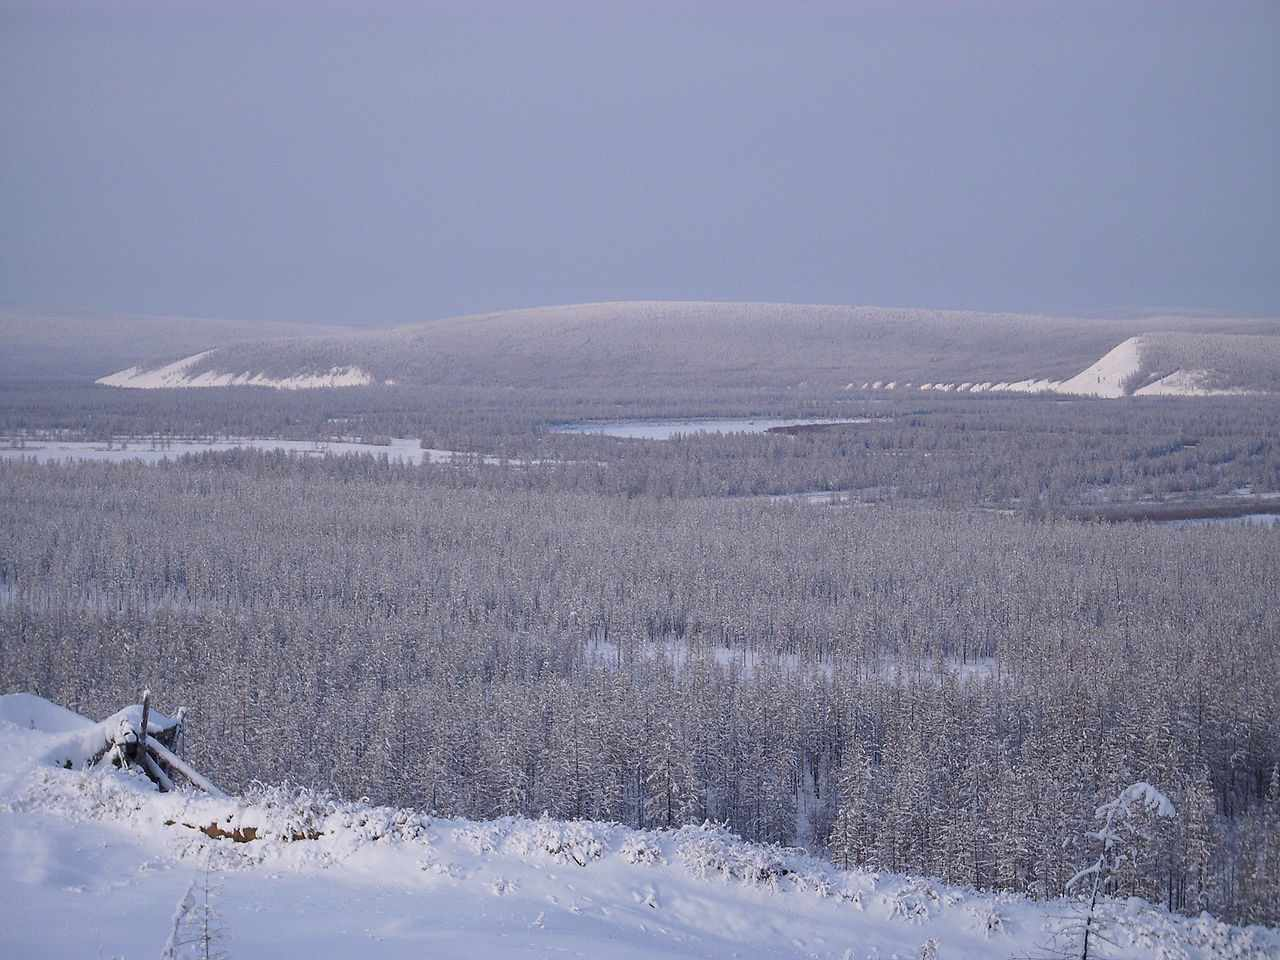 taiga in winter photo